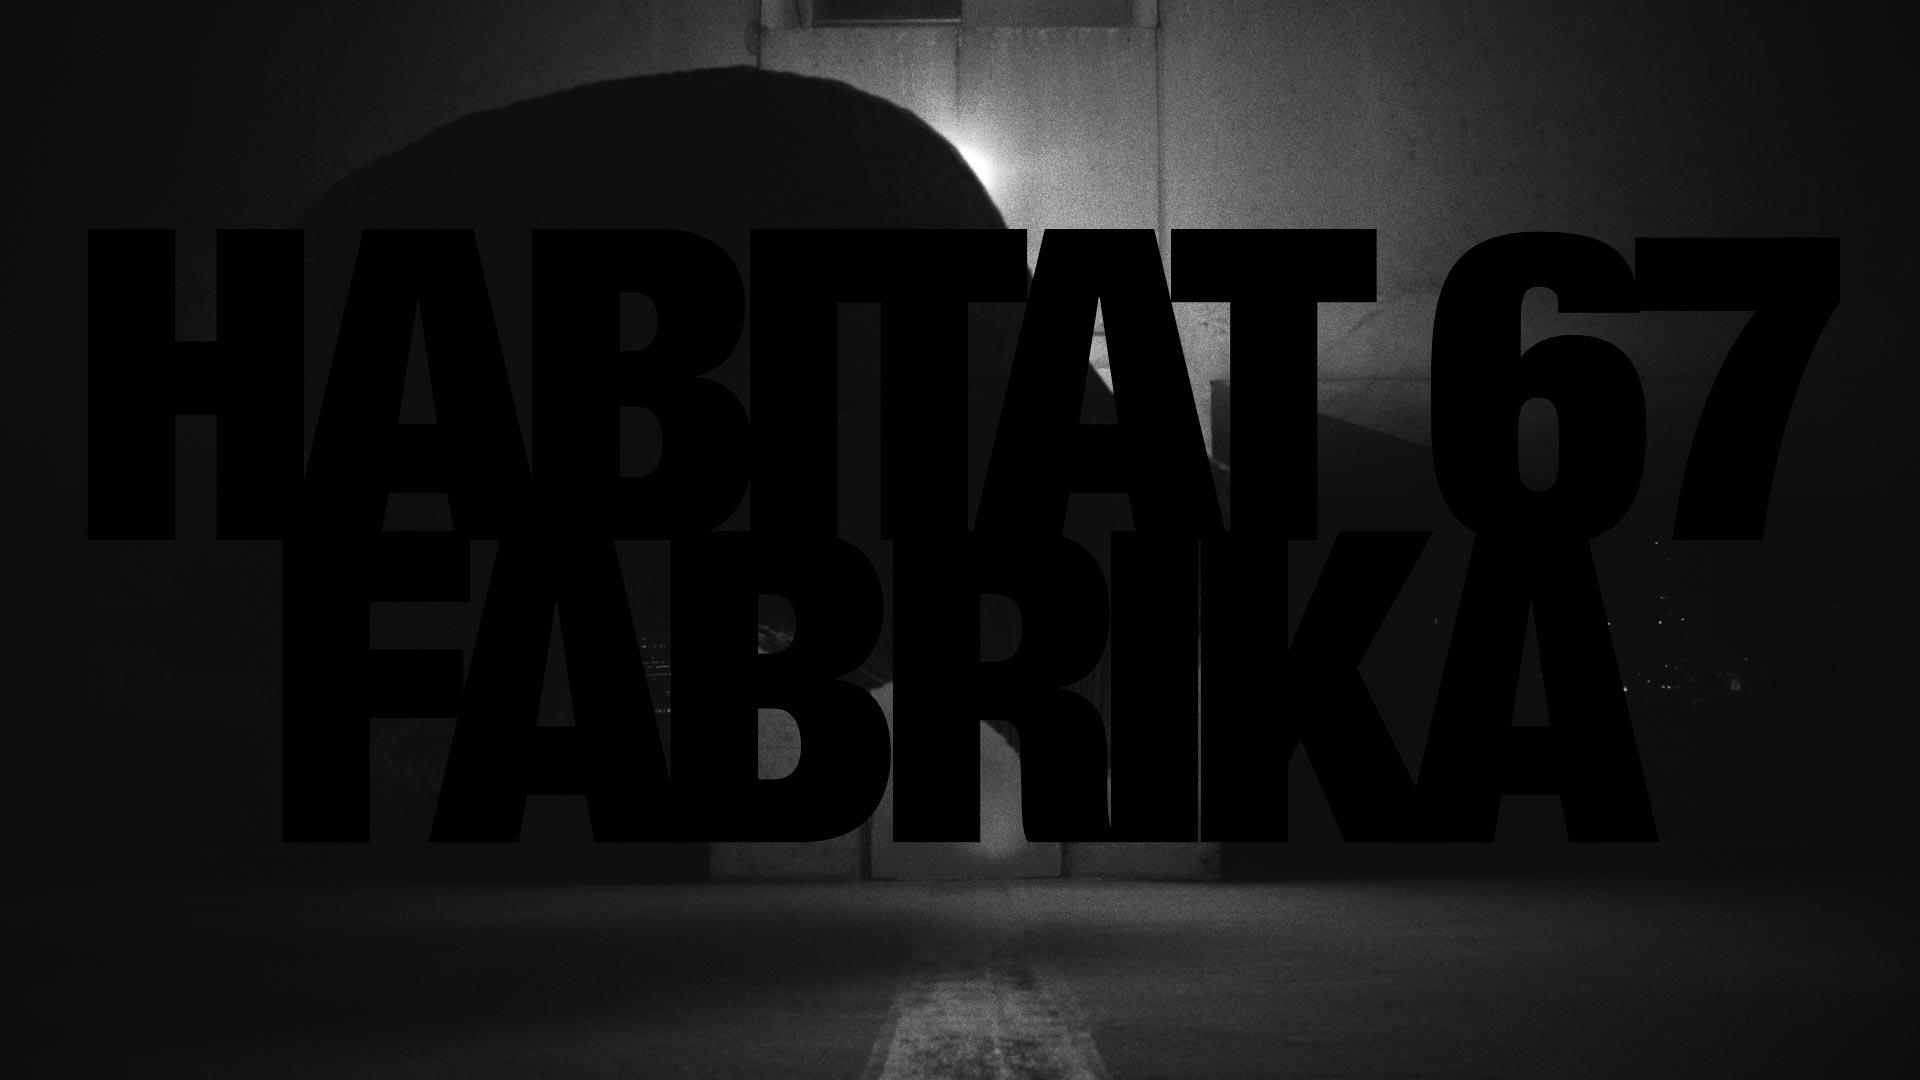 Habitat 67 / Fabrika